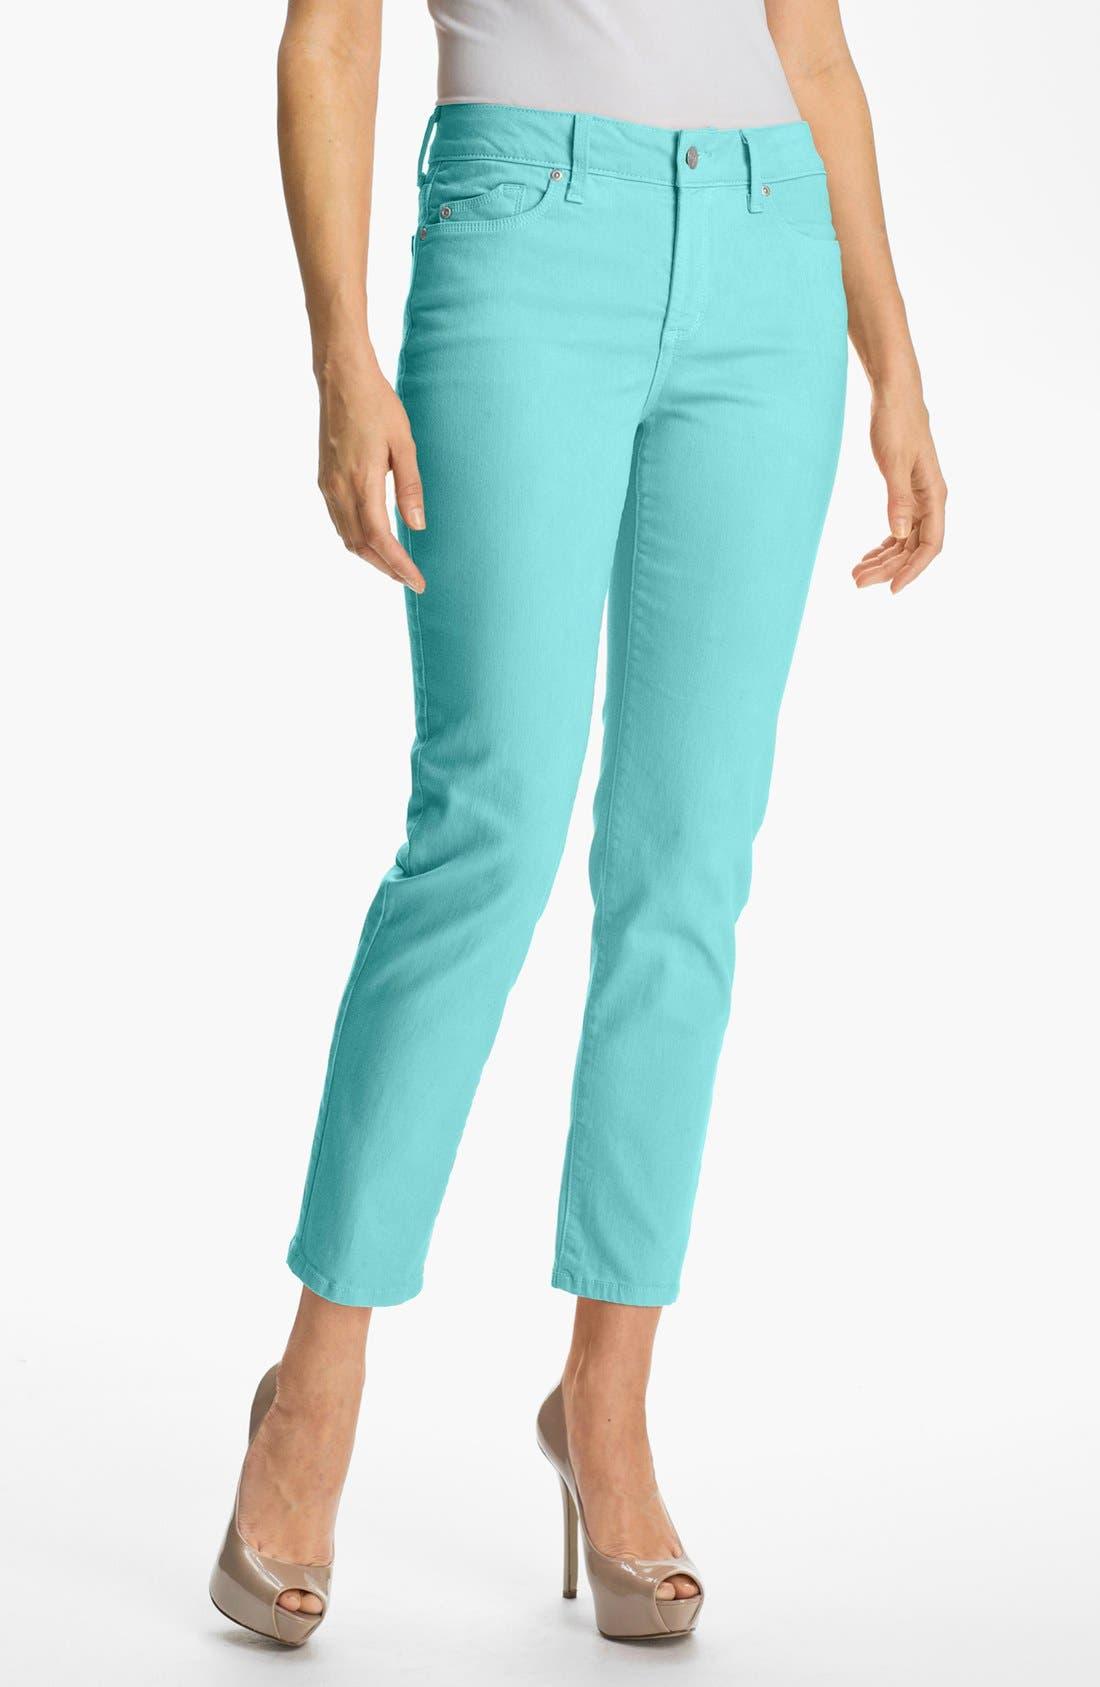 Alternate Image 1 Selected - NYDJ 'Alisha' Colored Stretch Ankle Skinny Jeans